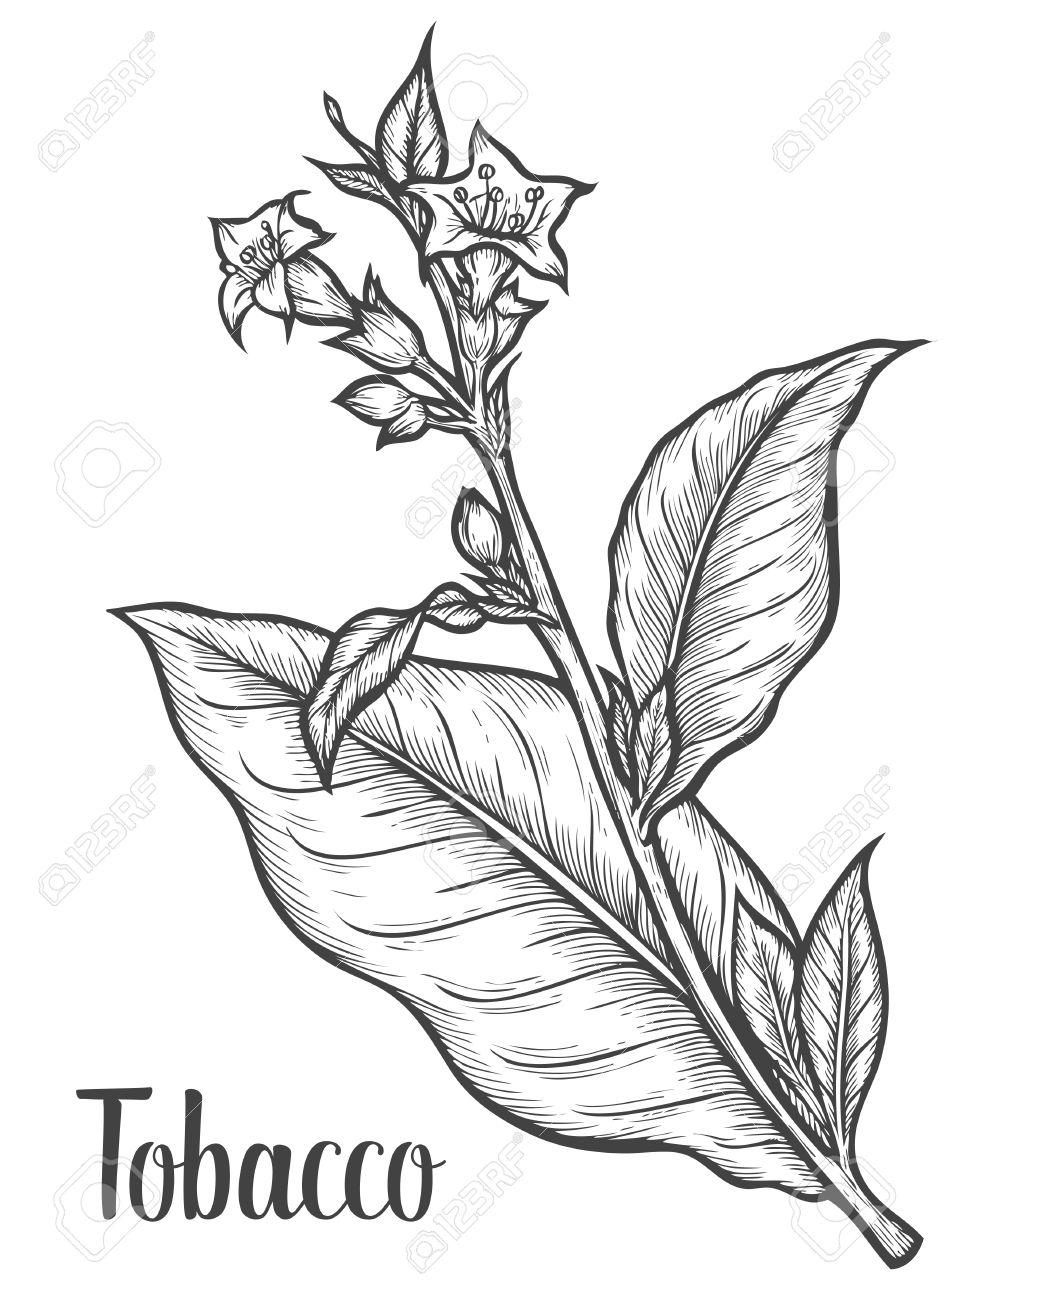 1040x1300 Tobacco Plant, Leaf, Flower. Ingredient For Smoking Pipe. Tobacco